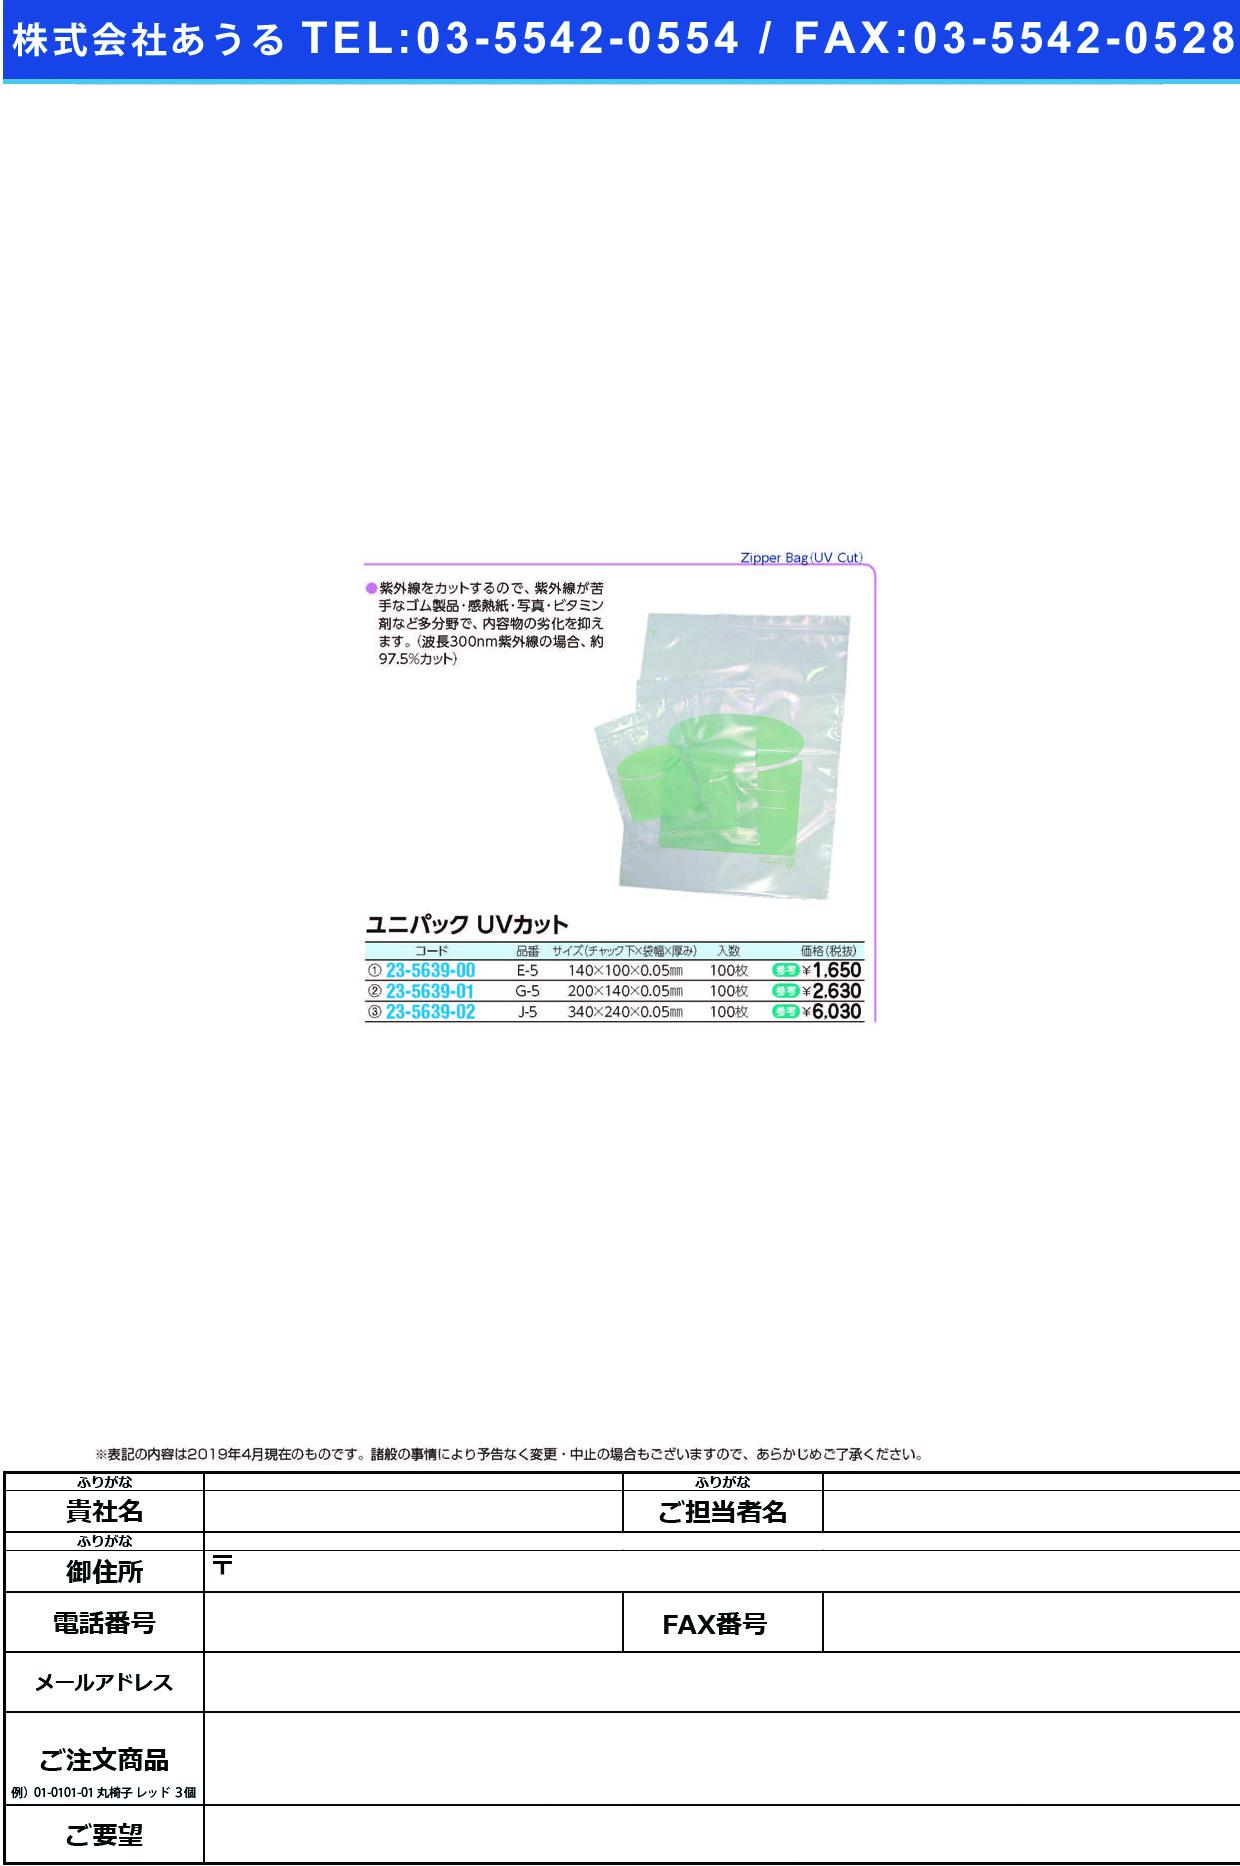 (23-5639-00)UVカットユニパックE−5 140X100X0.05(100マイ) UVカットユニパックE-5【1袋単位】【2019年カタログ商品】